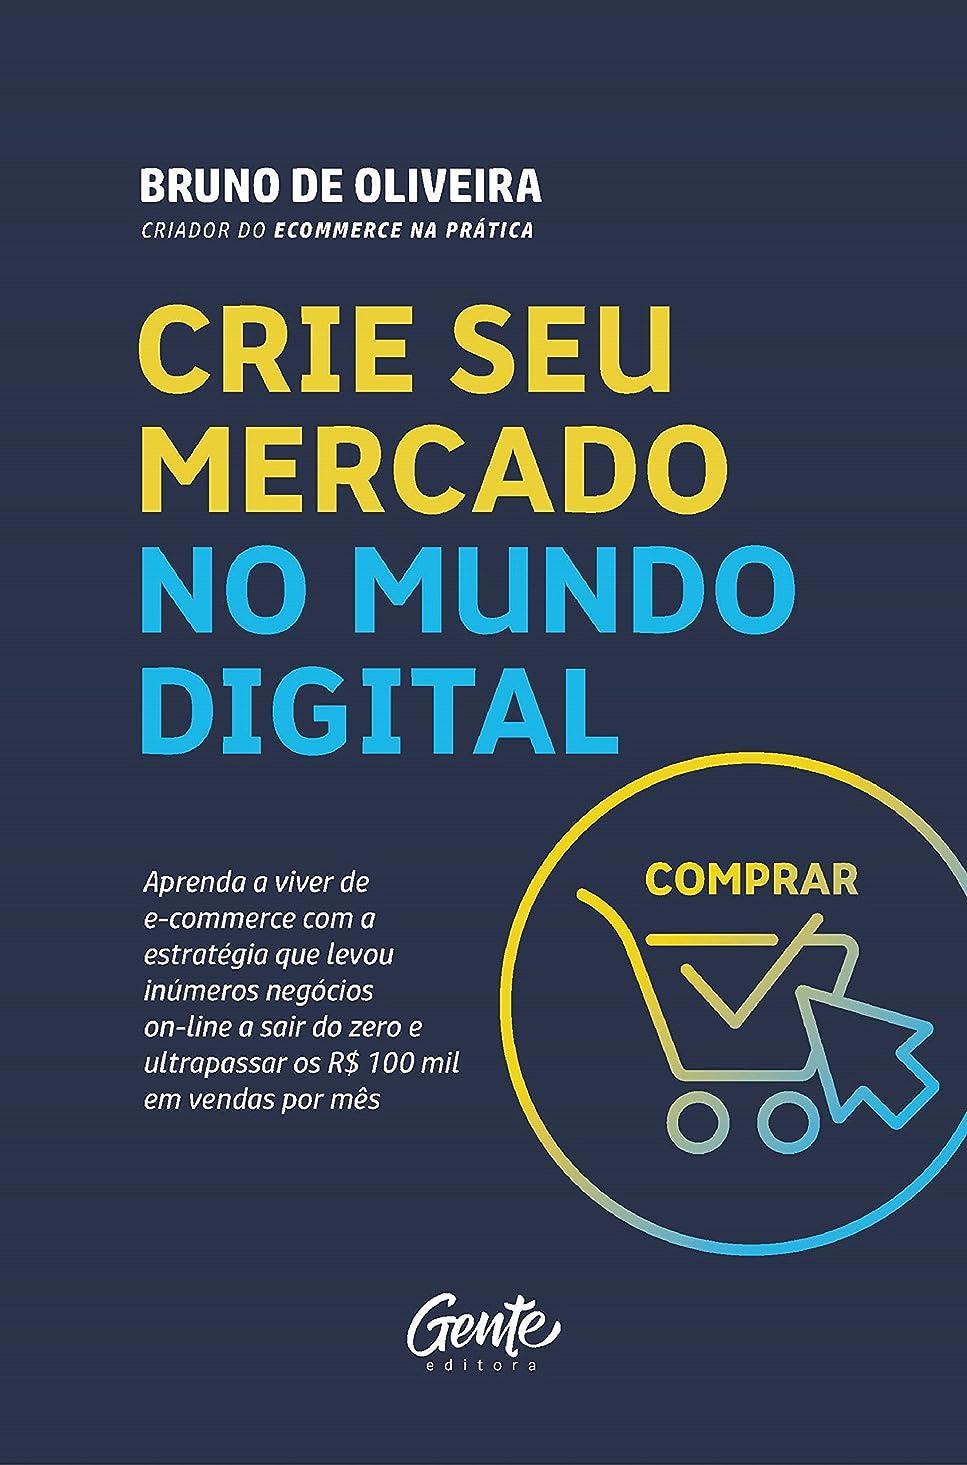 びっくり召喚する悲鳴Crie seu mercado no mundo digital: Aprenda a viver de e-commerce com a estratégia que levou inúmeros negócios on-line a sair do zero e ultrapassar os R$ 100 mil em vendas por mês (Portuguese Edition)